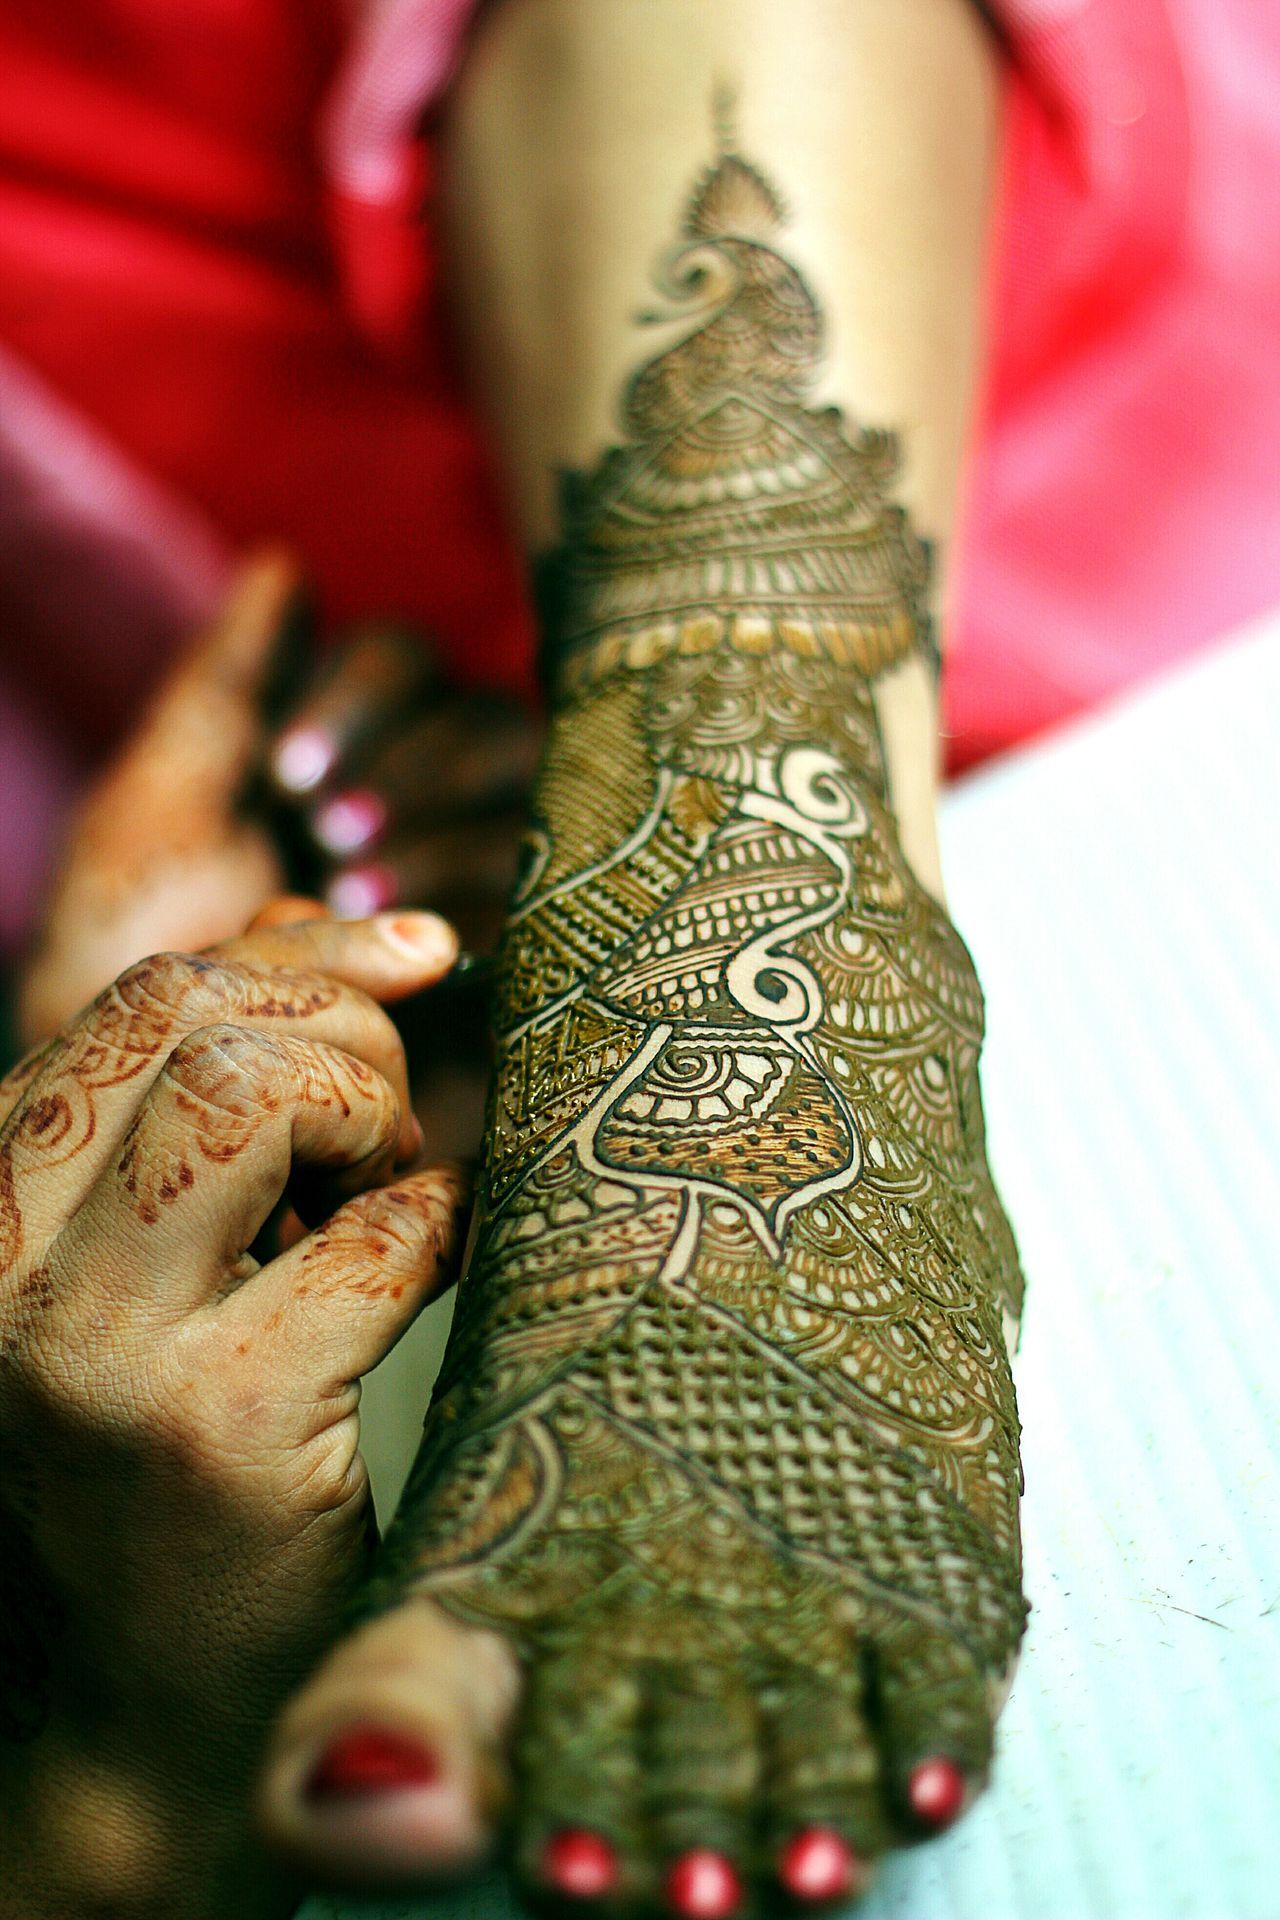 Every Picture Tells A Story Tunesofmarriage Indianculture Mehendi Art Candid Photography IndianWedding Mehendi Night Weddingpreparations Indianweddings Storyteller Weddingstory Candidmoments Candidphotography